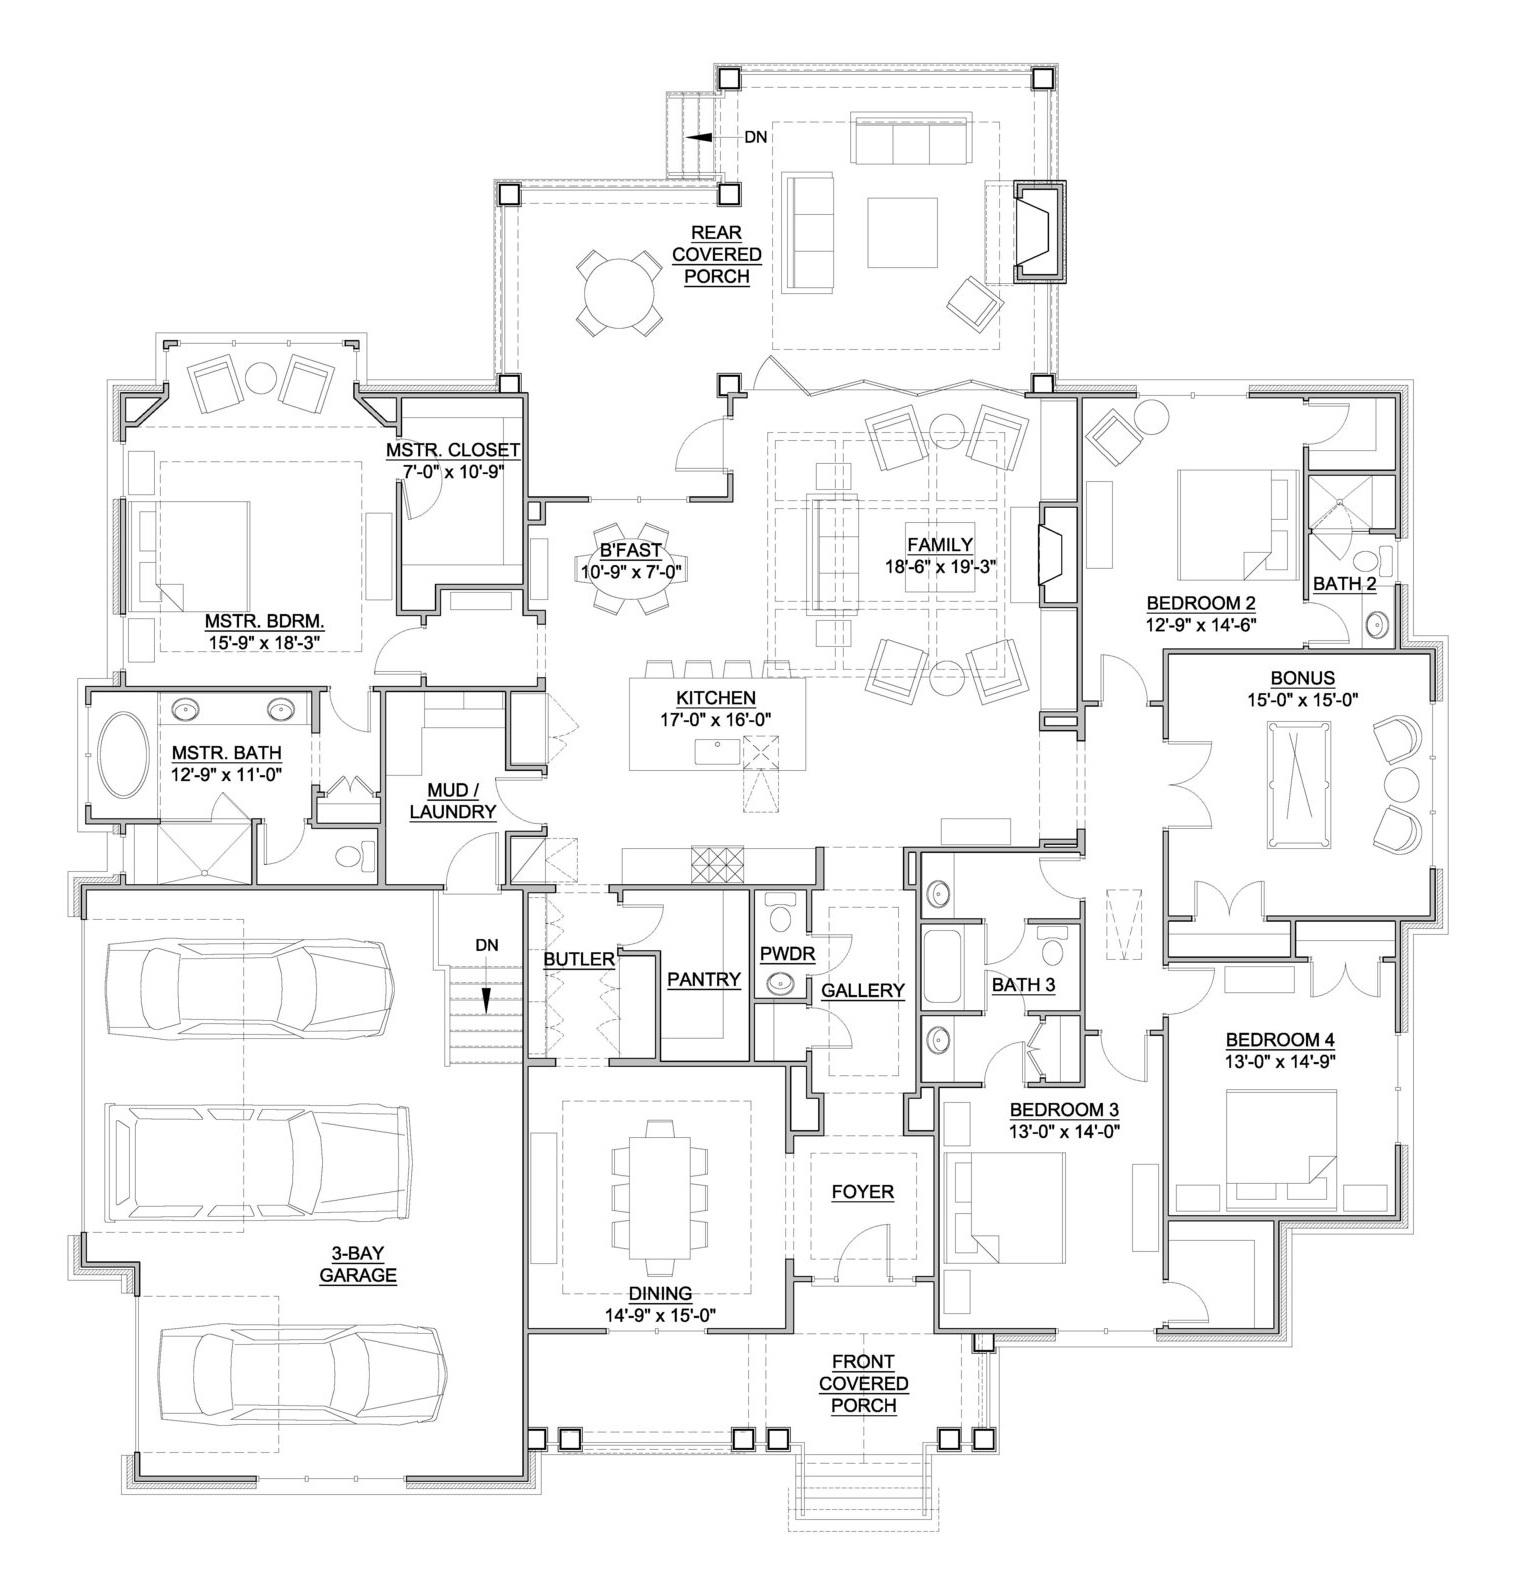 Riverchase_Charles+C+CRAWL_%282%29+First+Floor+Plan+%5B24x36%5D.jpg